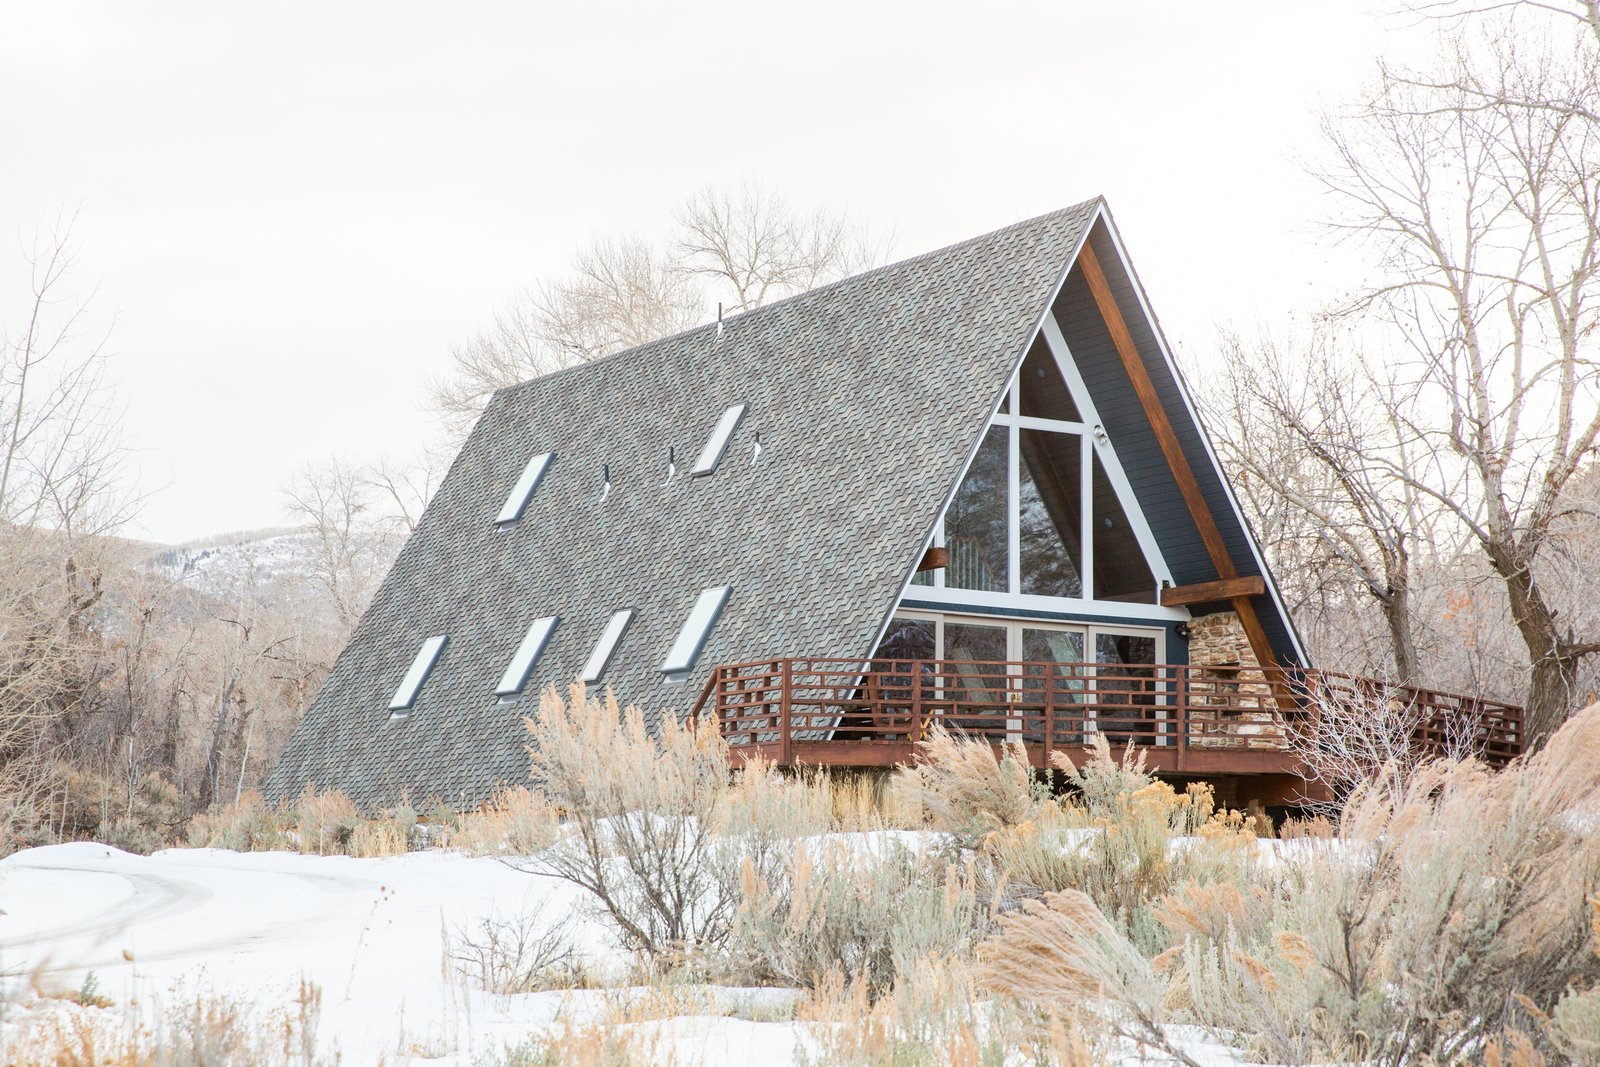 Before & After: An A-Frame Cabin Boasts Serious Scandinavian Vibes